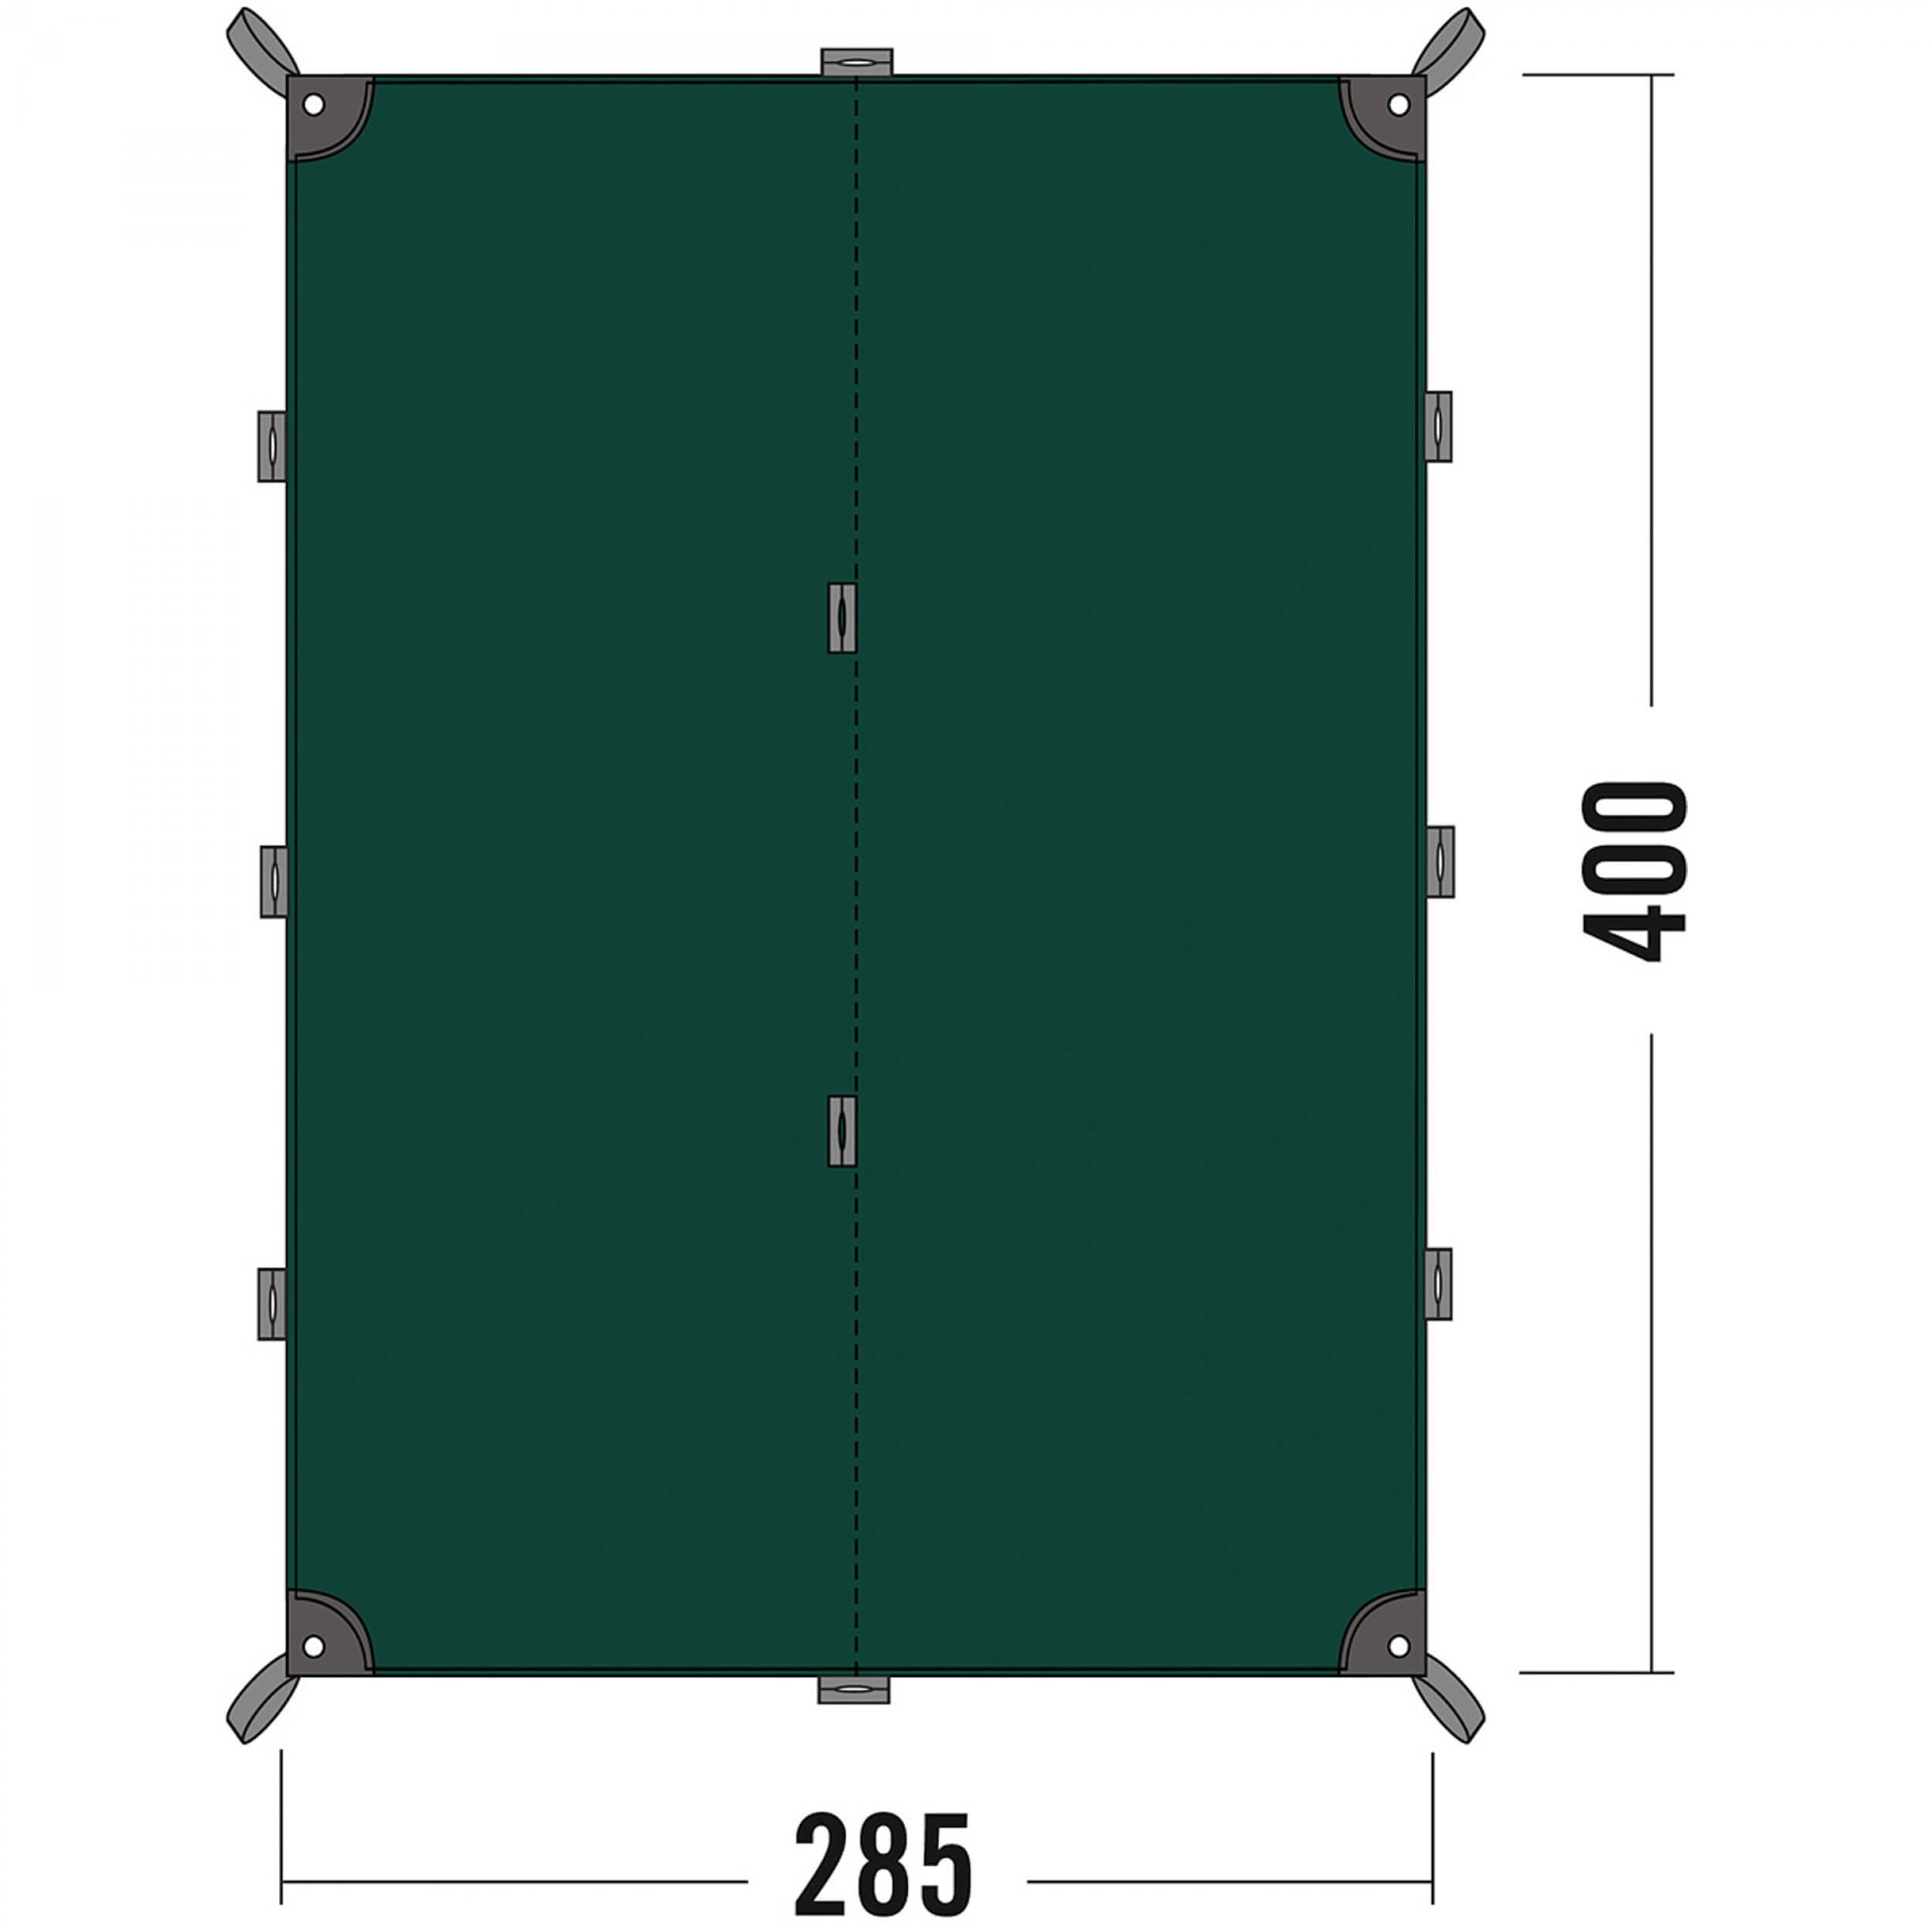 tatonka tarp 4 gr n sonnensegel au enzelt wasserdicht abdeckplane ebay. Black Bedroom Furniture Sets. Home Design Ideas